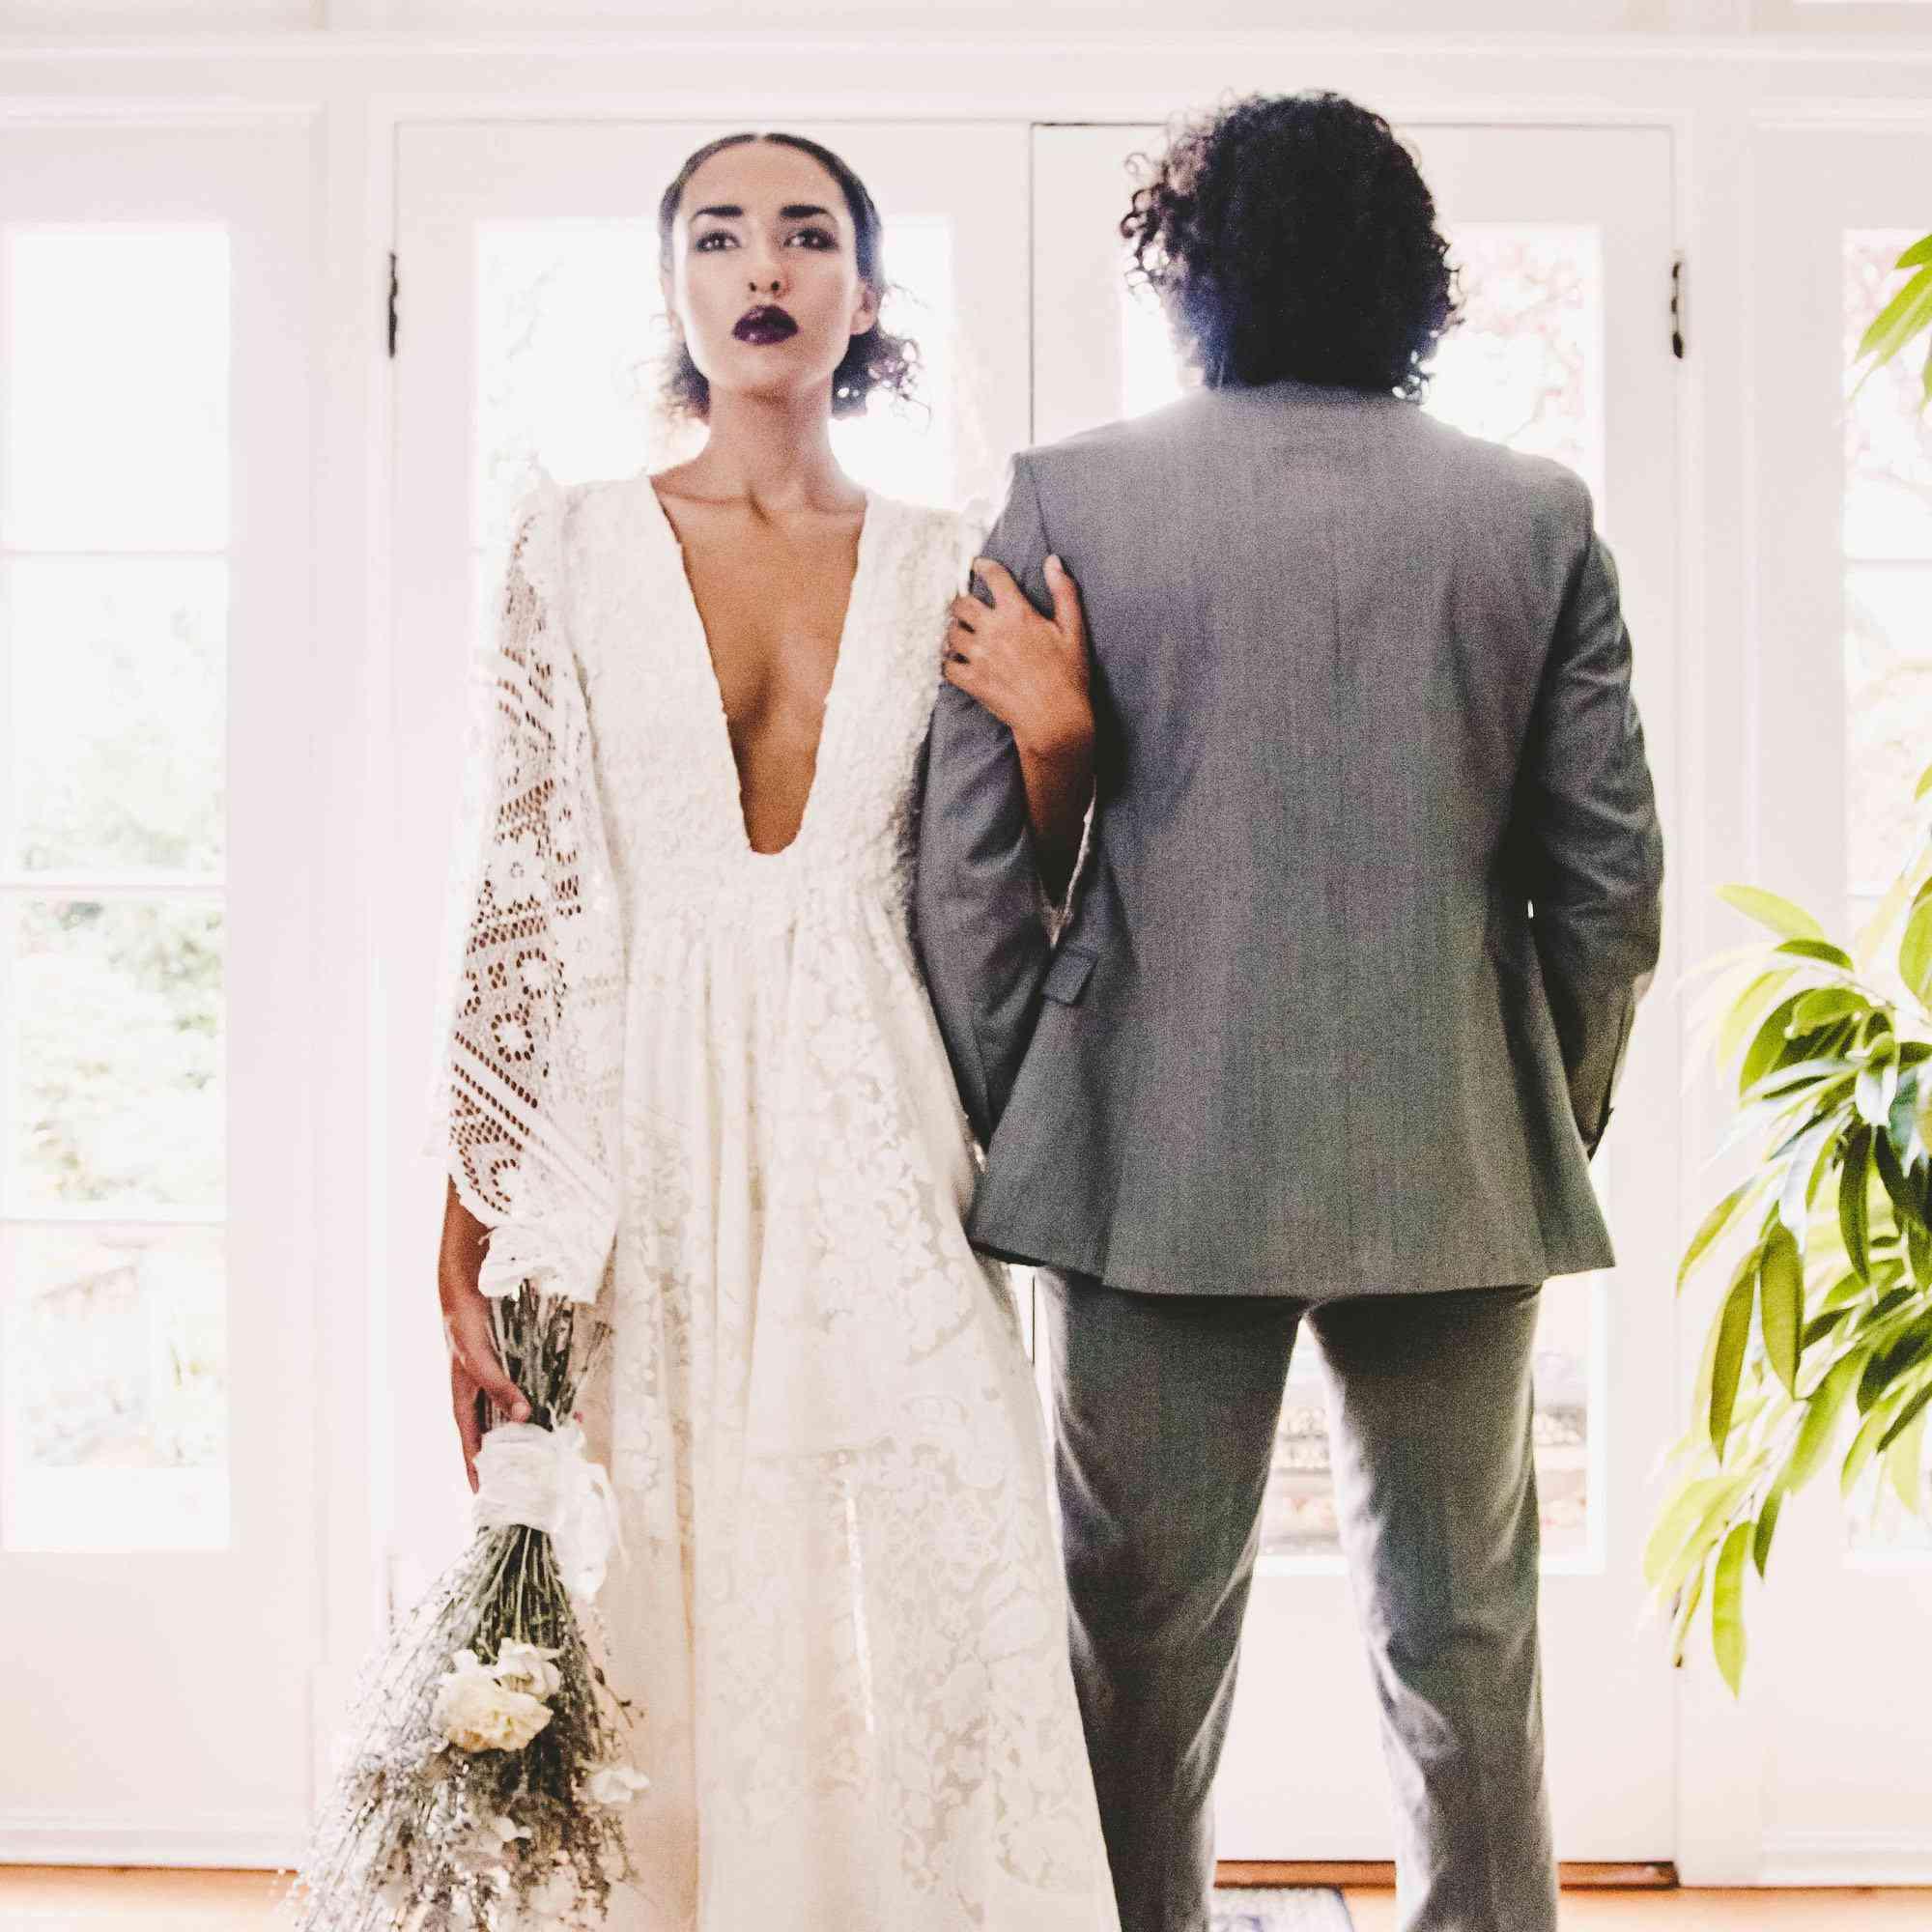 2019 Wedding Trends.Etsy Releases Top Wedding Trends Of 2019 To Inspire Your